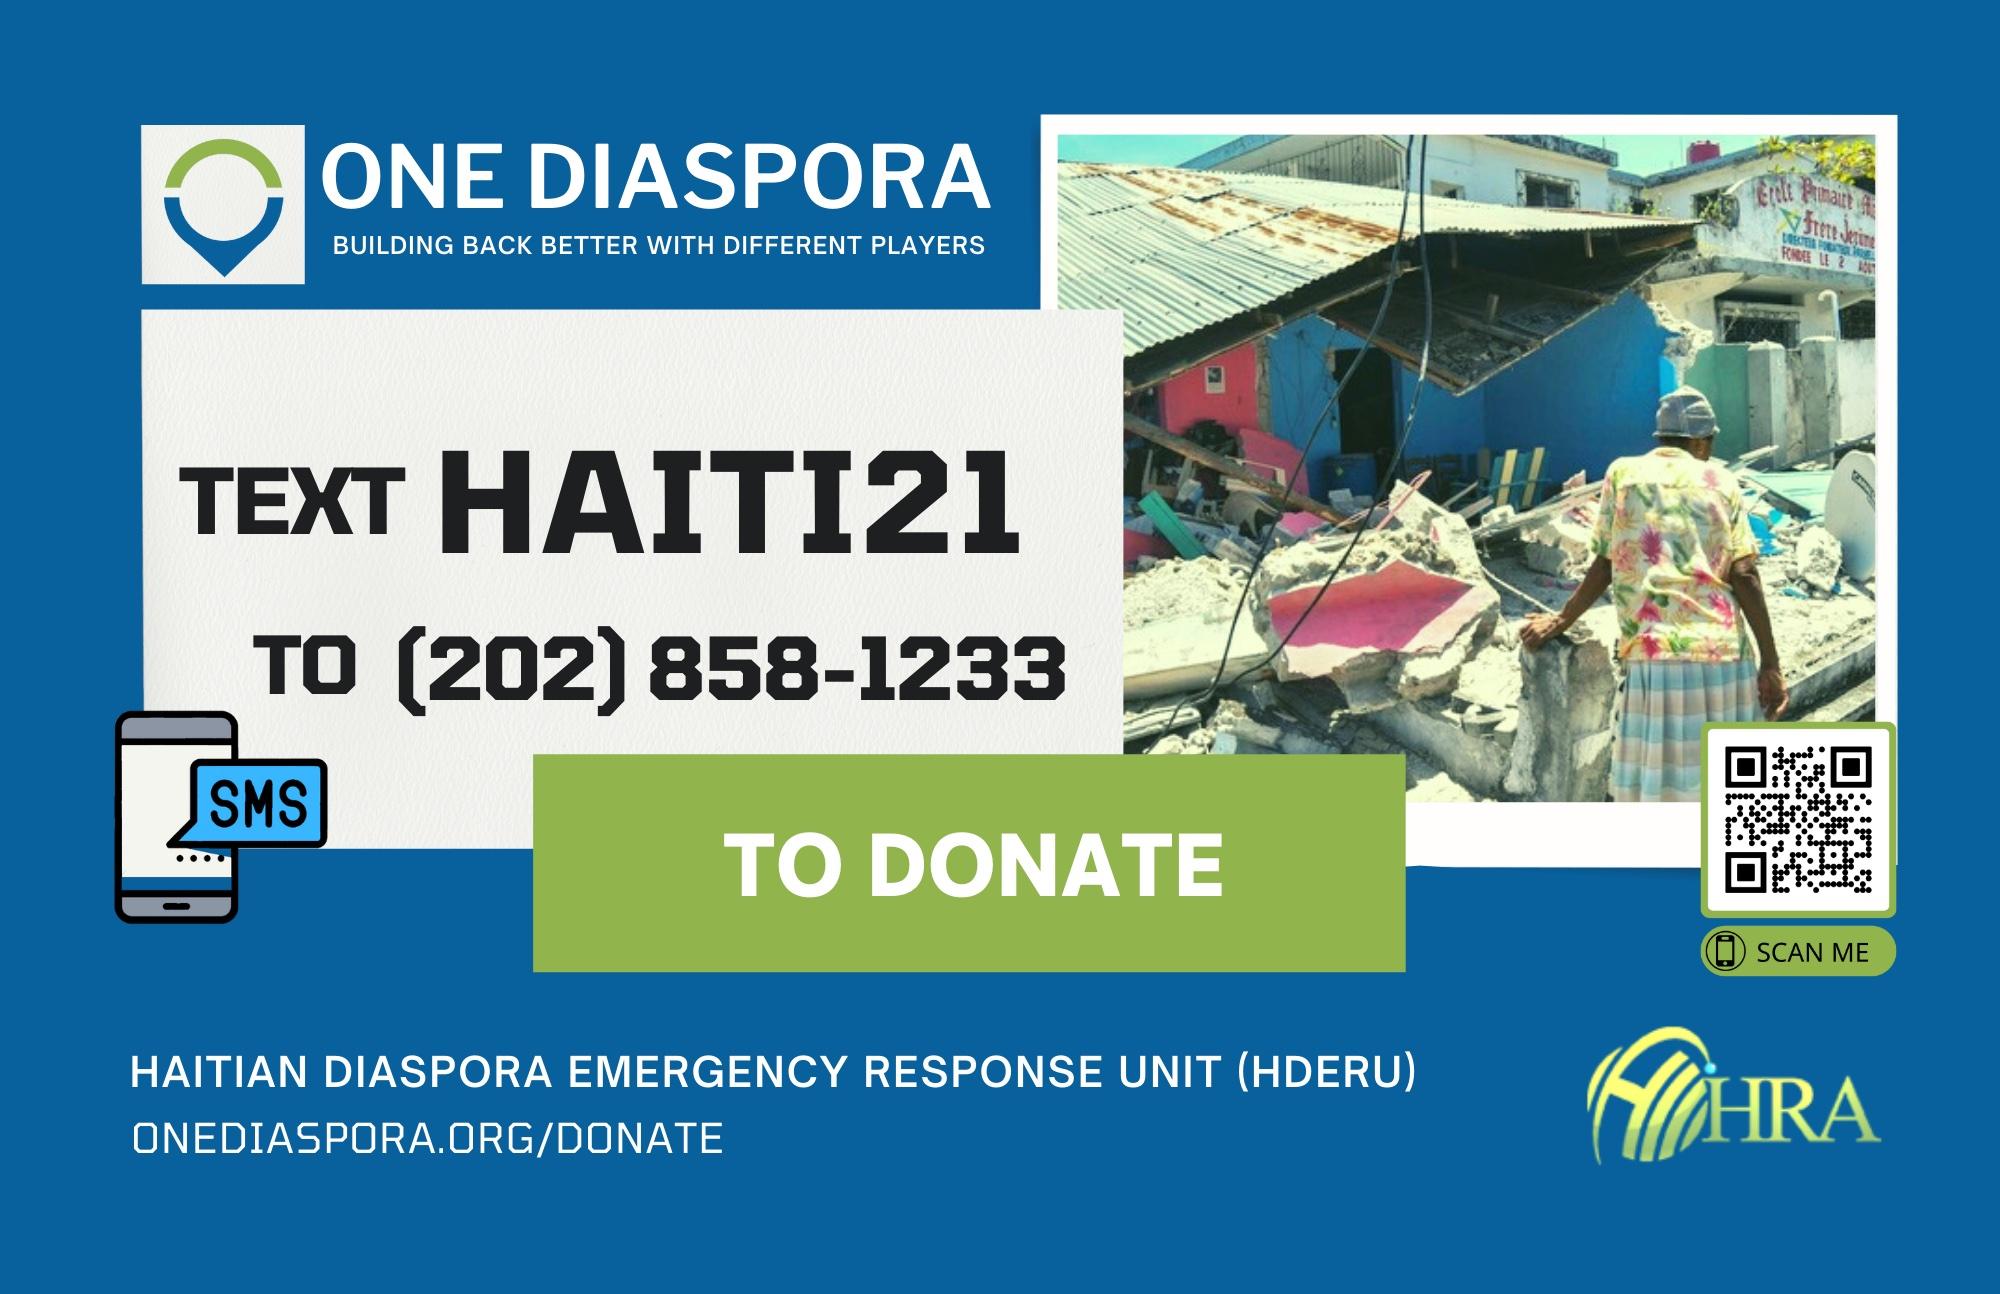 Haiti Renewal Alliance via OneDiaspora.Org Activates Emergency Response Unit for Haiti Earthquake 2021